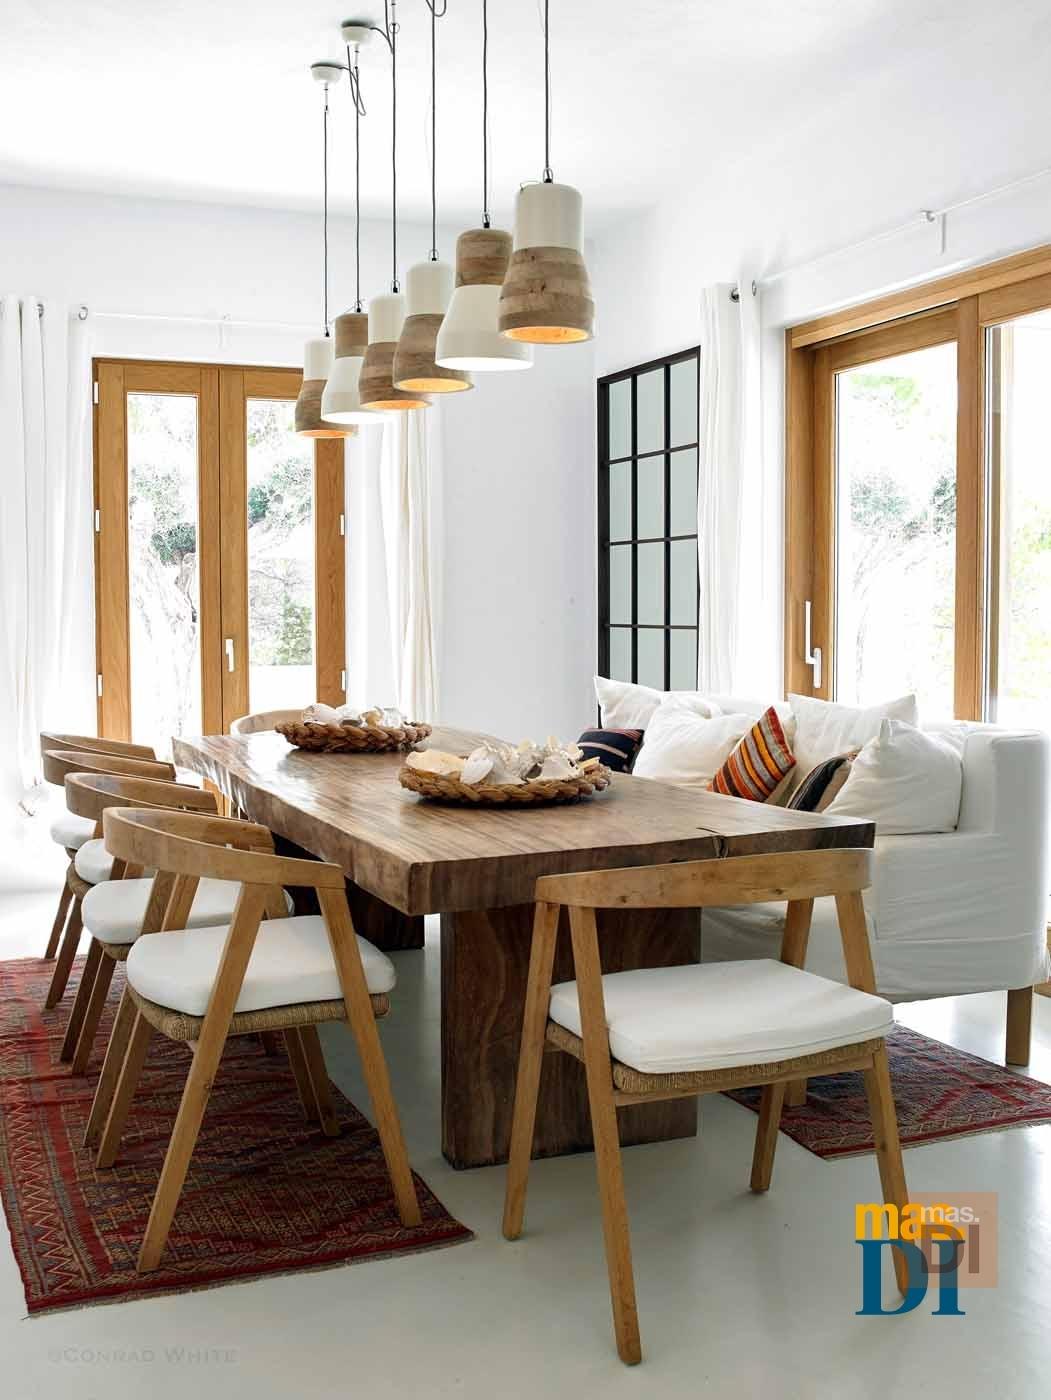 Objetos decoracion hogar awesome refrescar tu hogar con de decoracin with objetos decoracion - Objetos decoracion ...